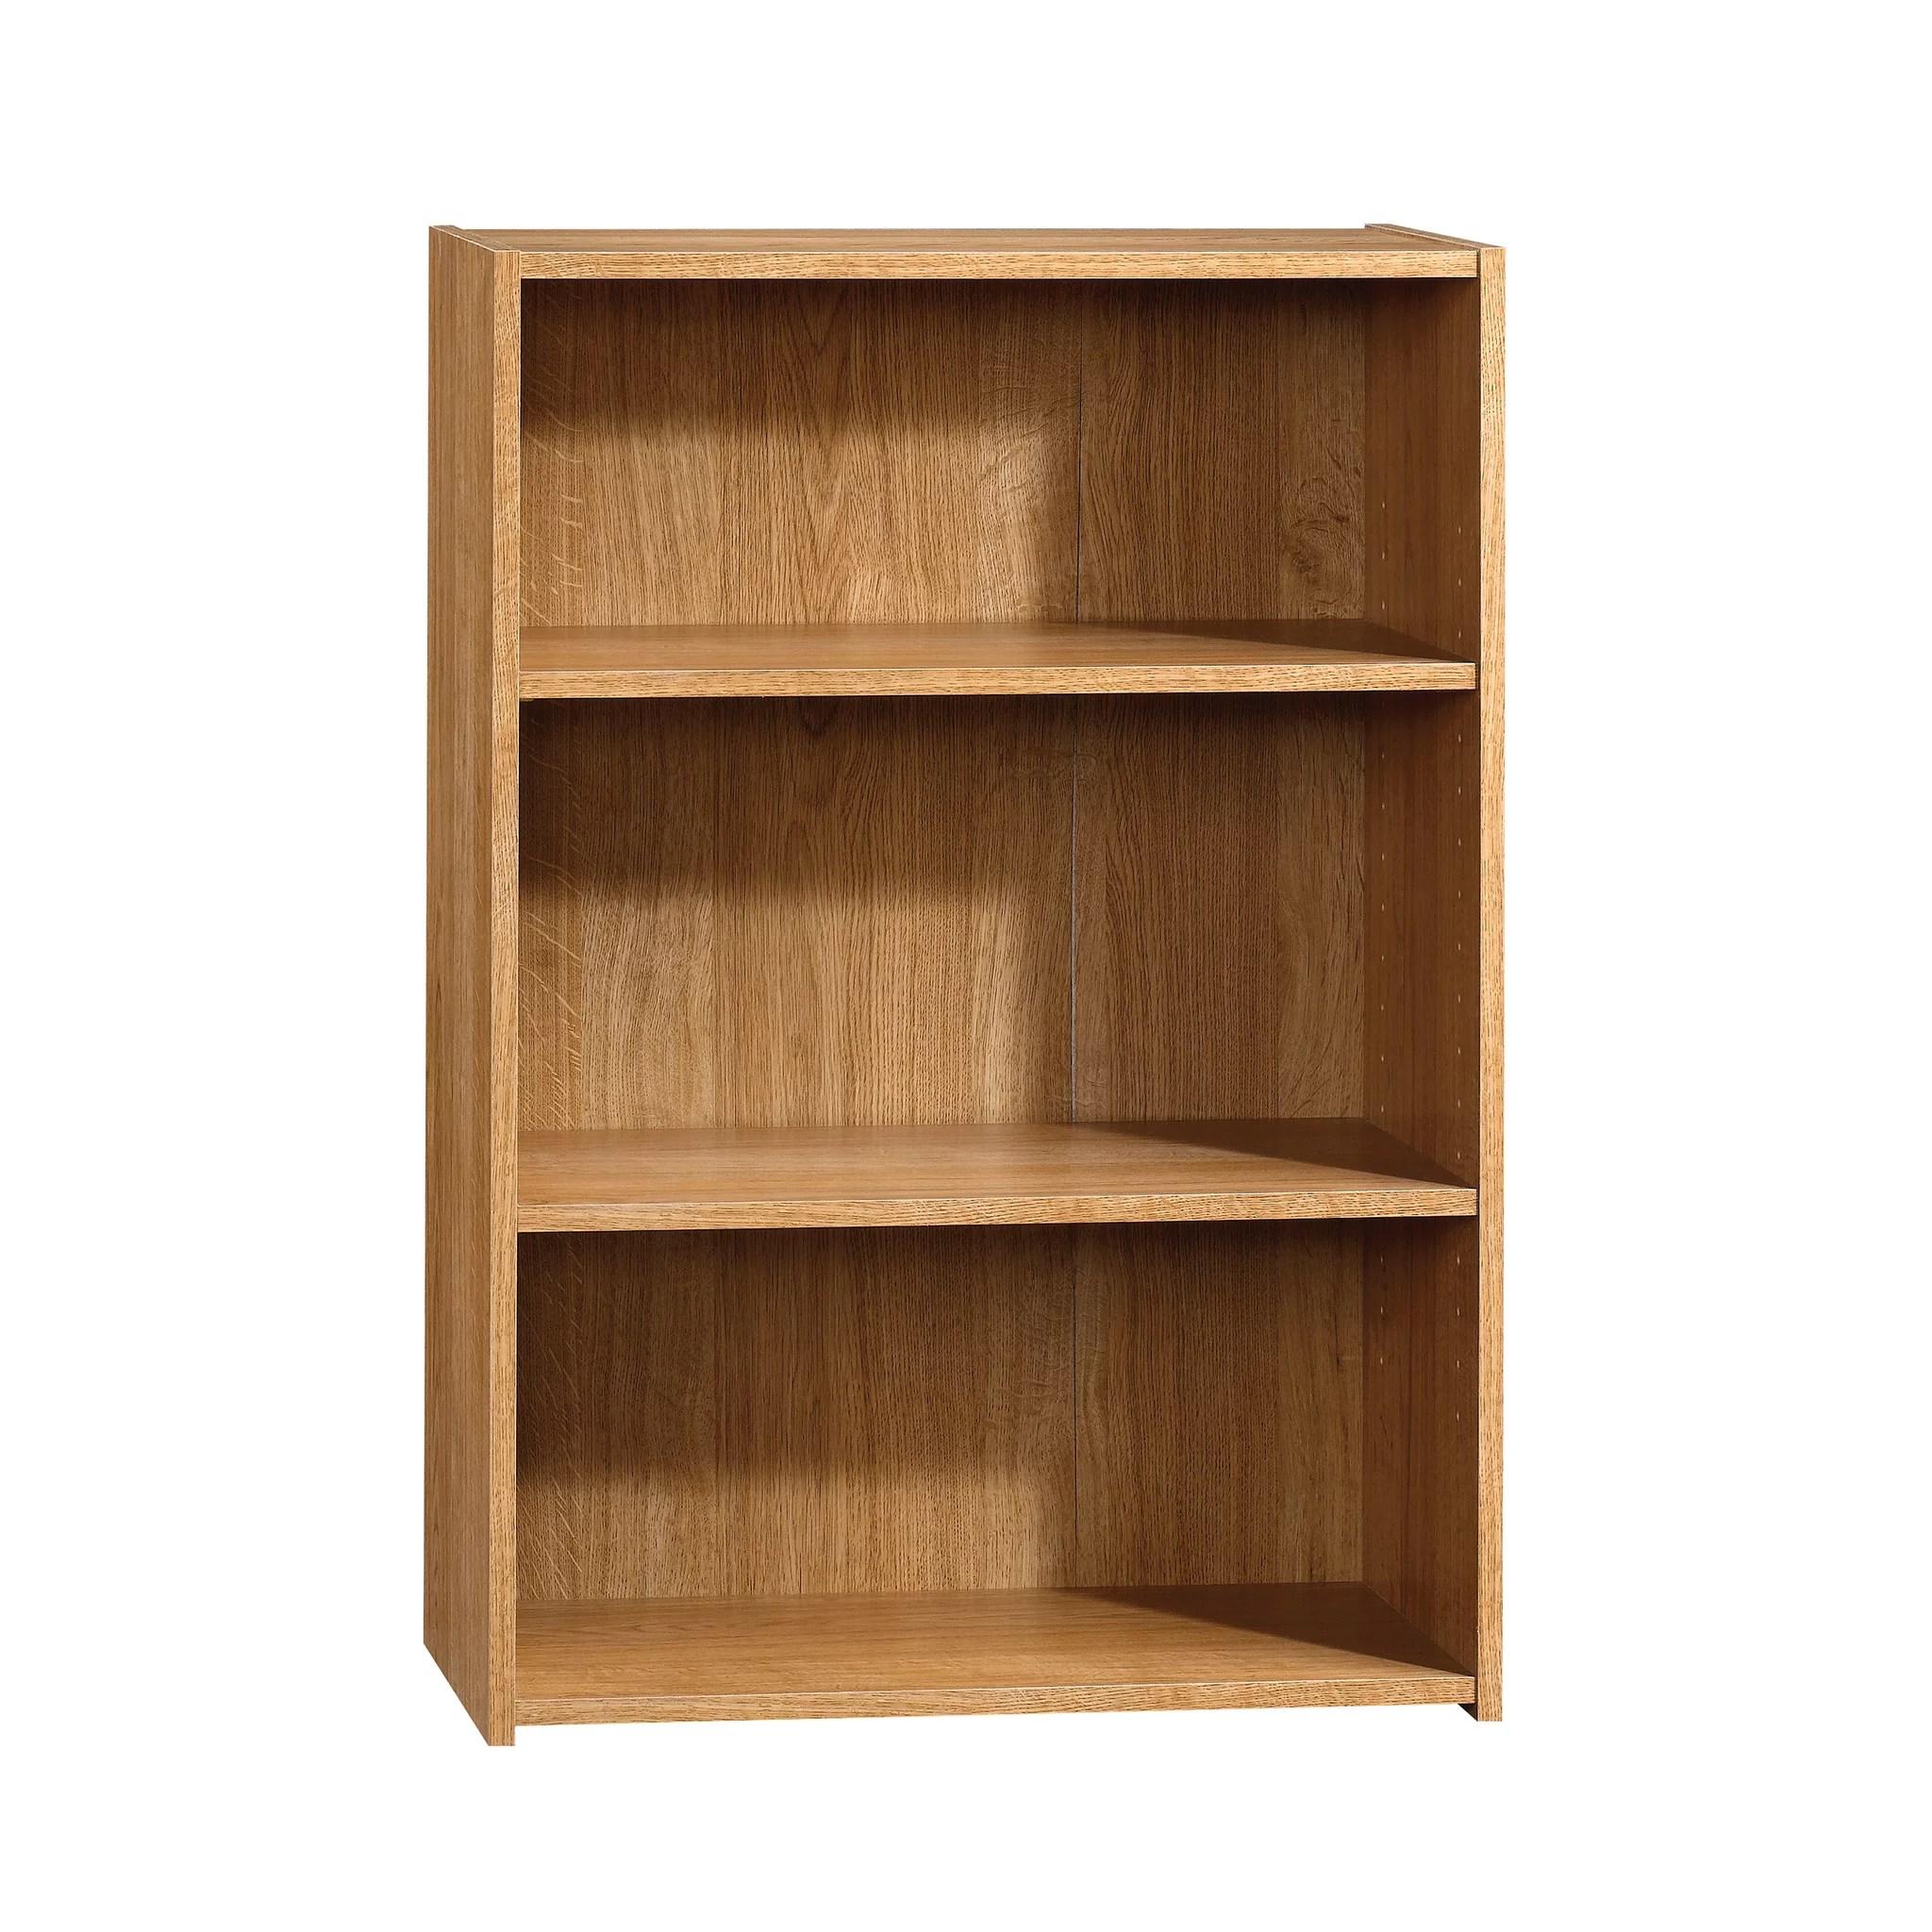 Sauder Beginnings 35 3 Shelf Standard Bookcase Multiple